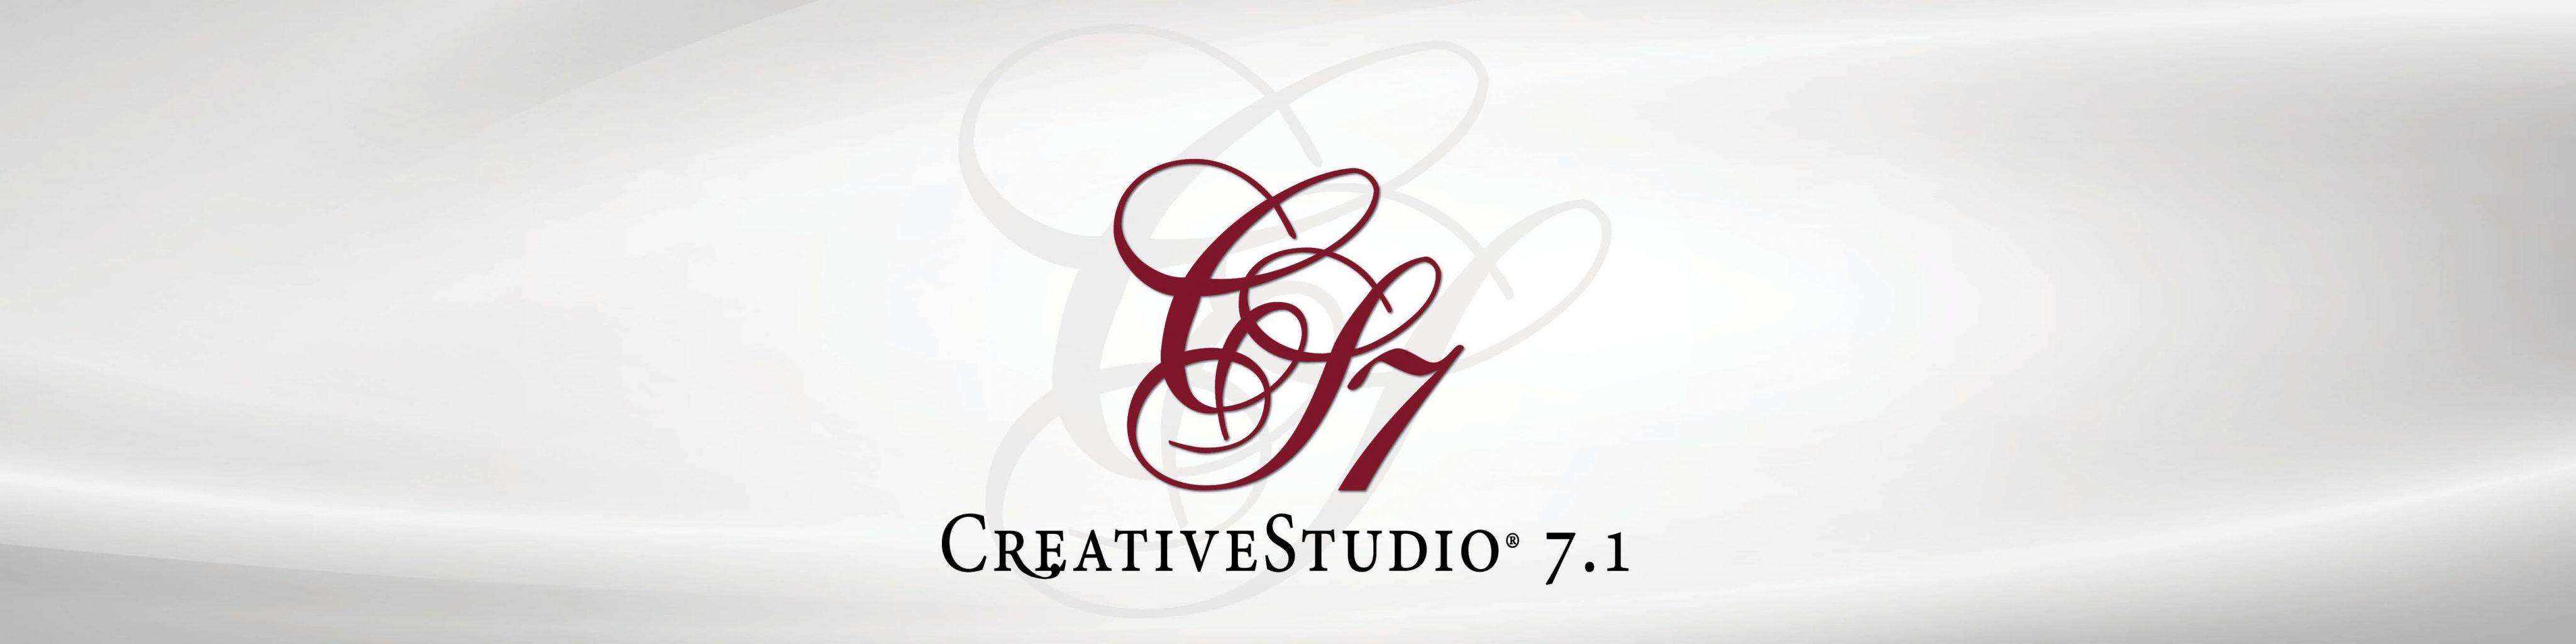 Creative Studio 7.1 Banner